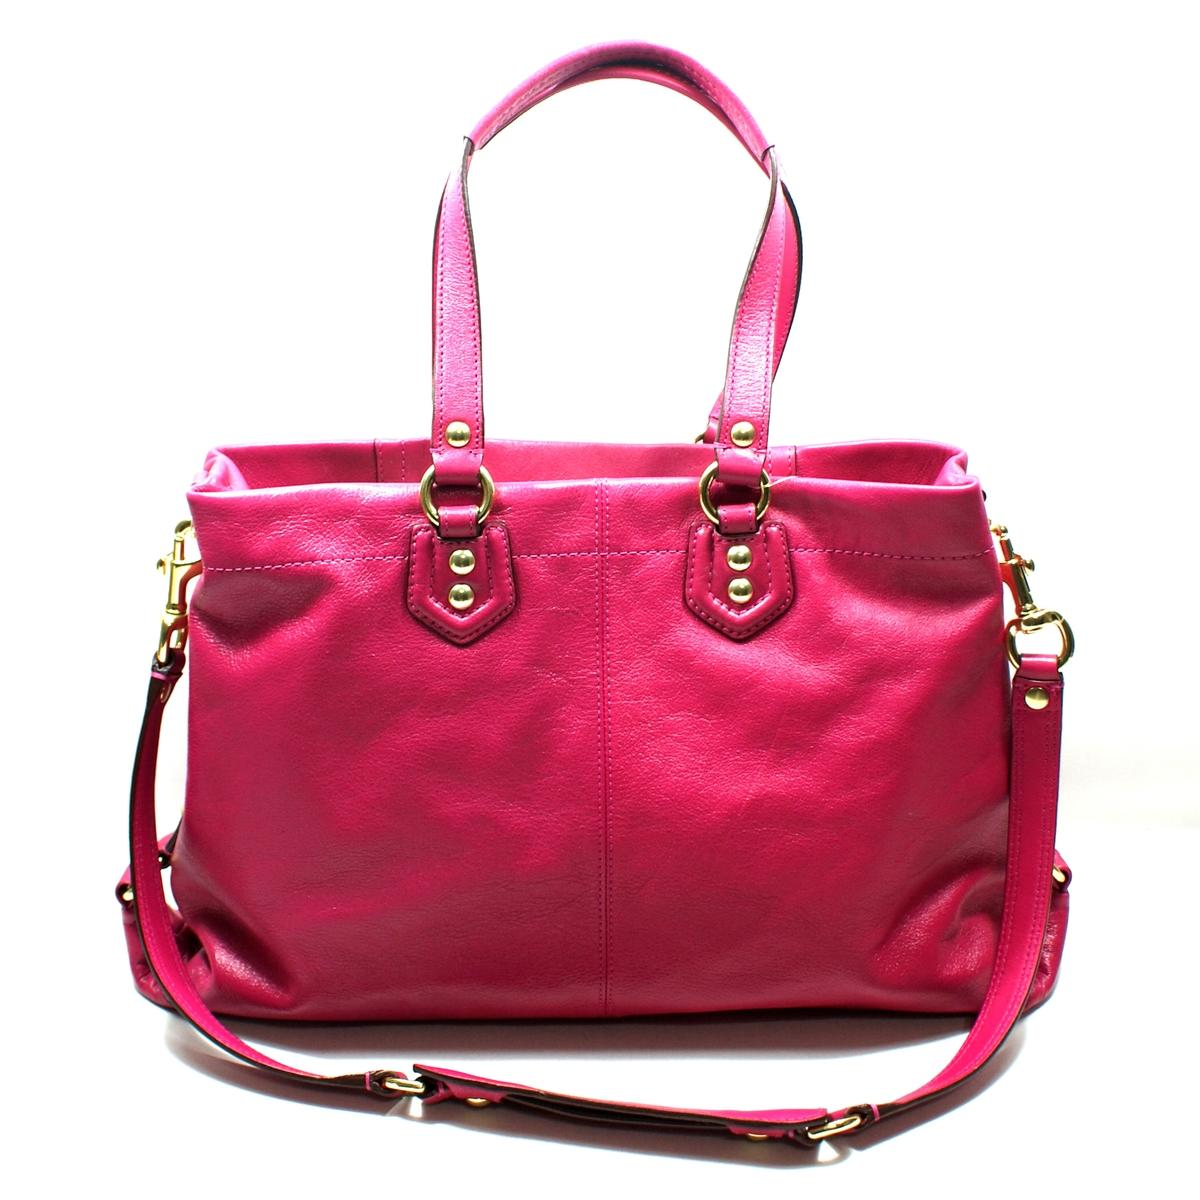 Coach Ashley Leather Carryall Handbag Shoulder Bag